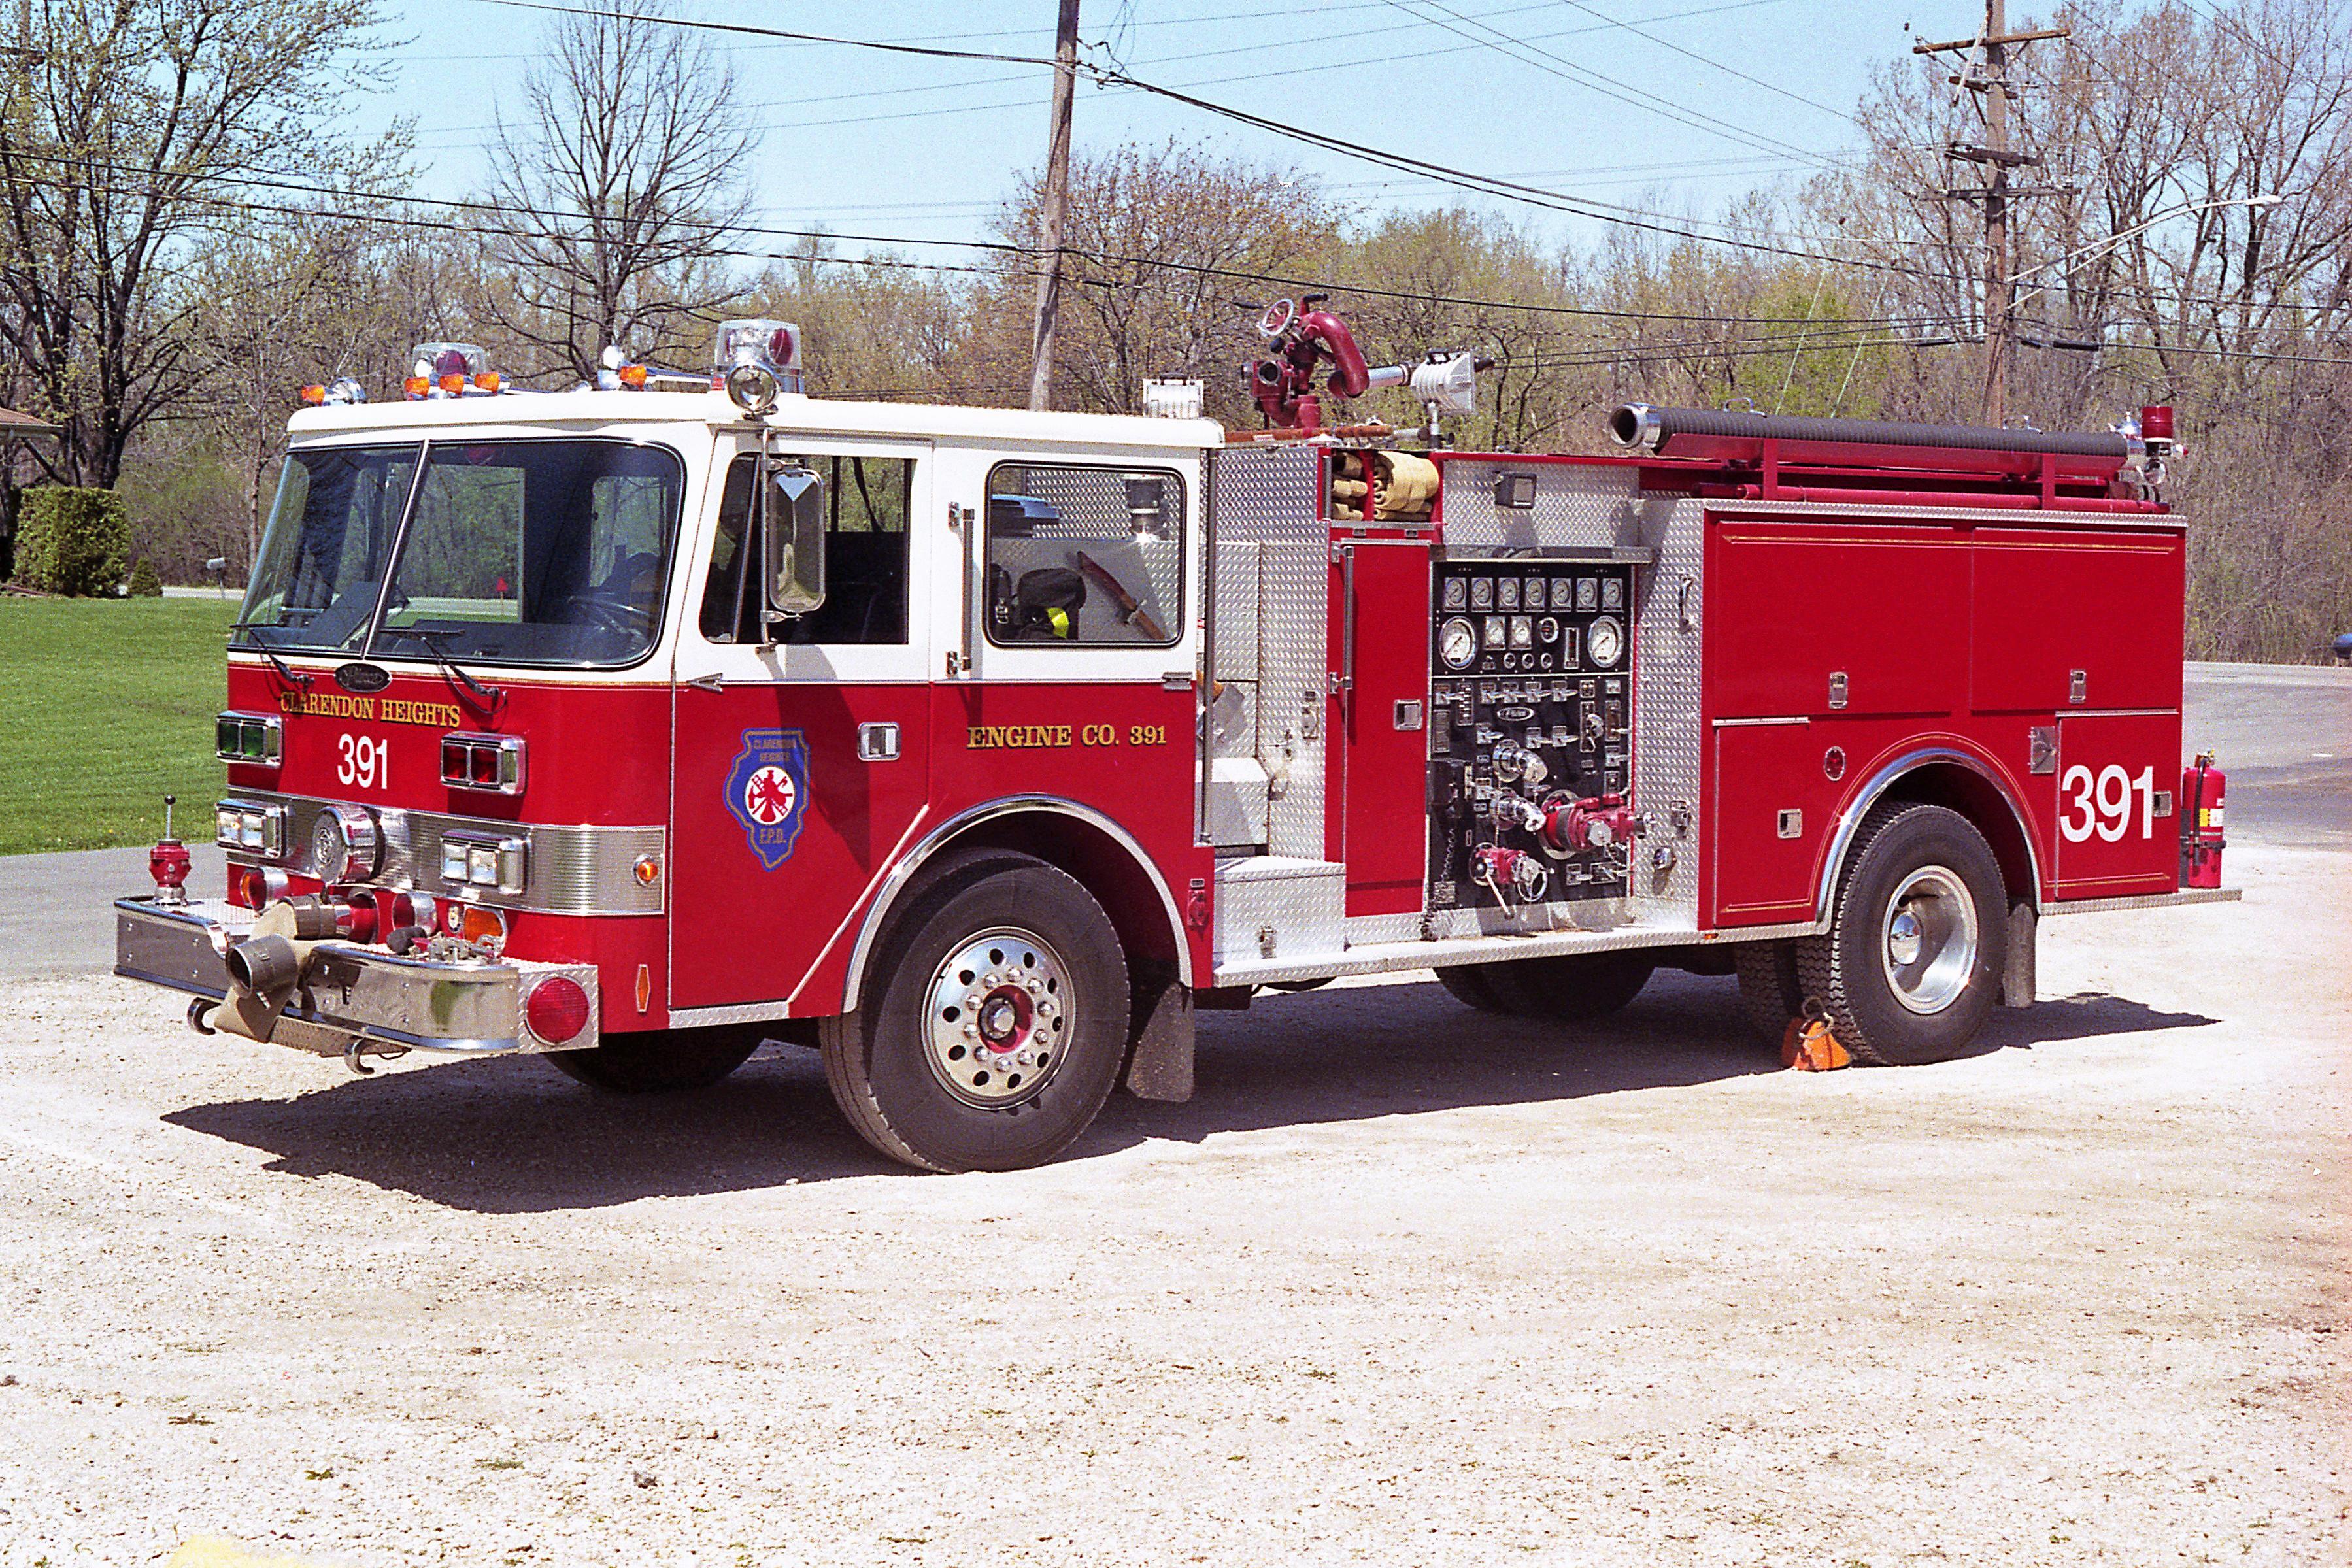 CLARENDON HEIGHTS ENGINE 391 1985 PIERCE ARROW 1500-750 # E-2558 - NOW TRI STATE ENGINE 541